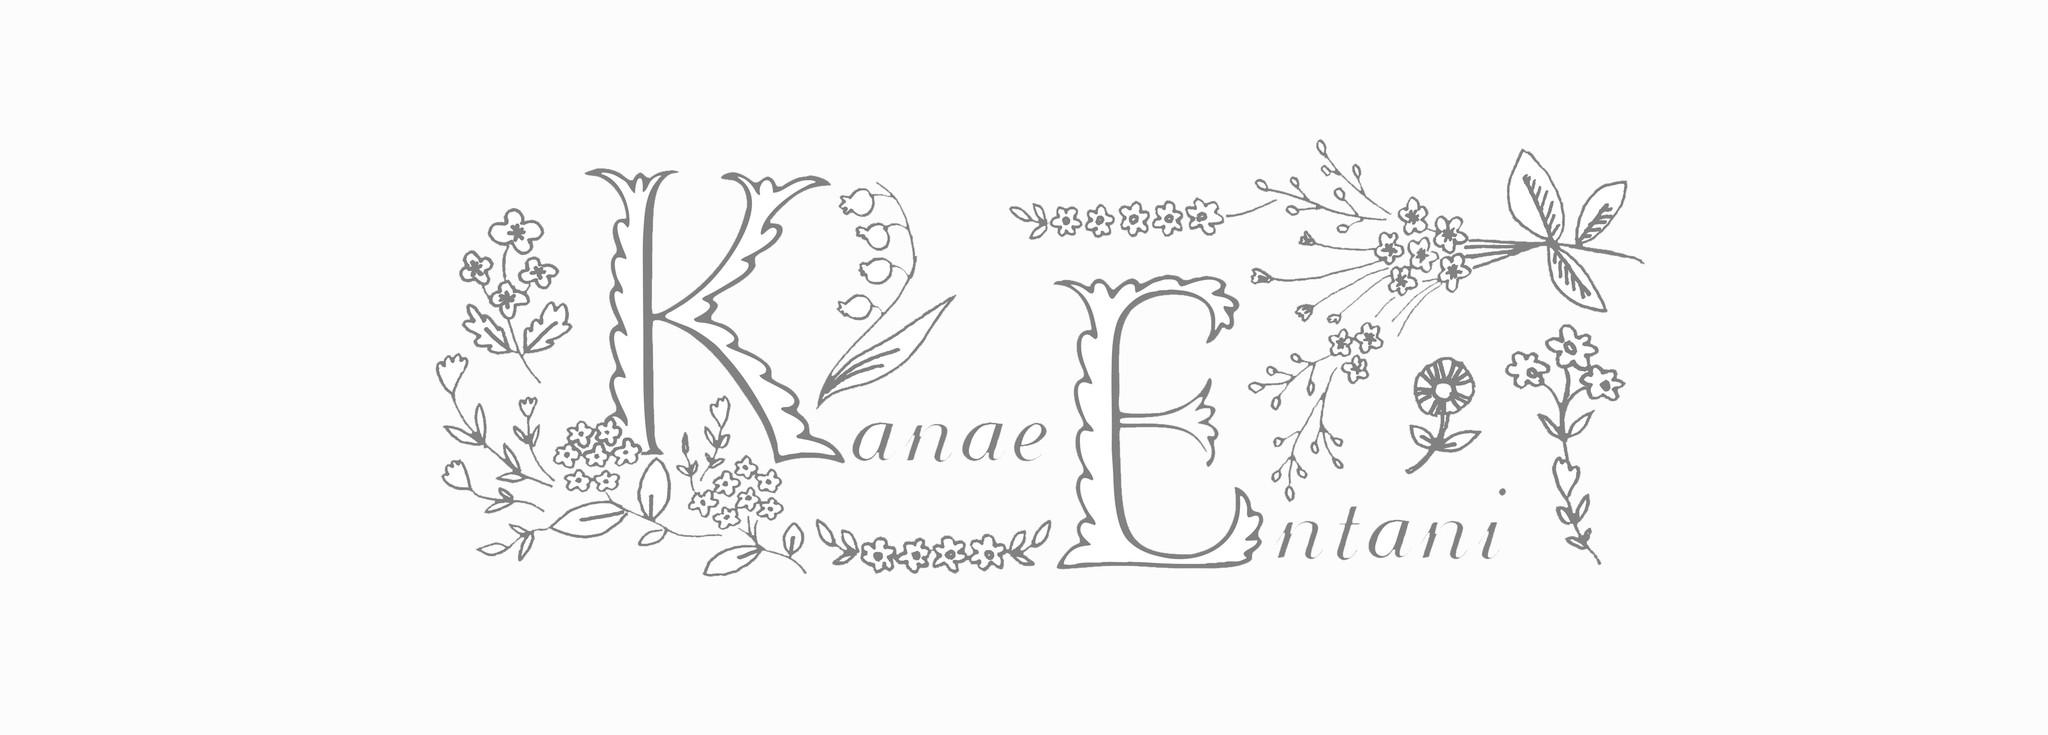 kanae entani embroidery